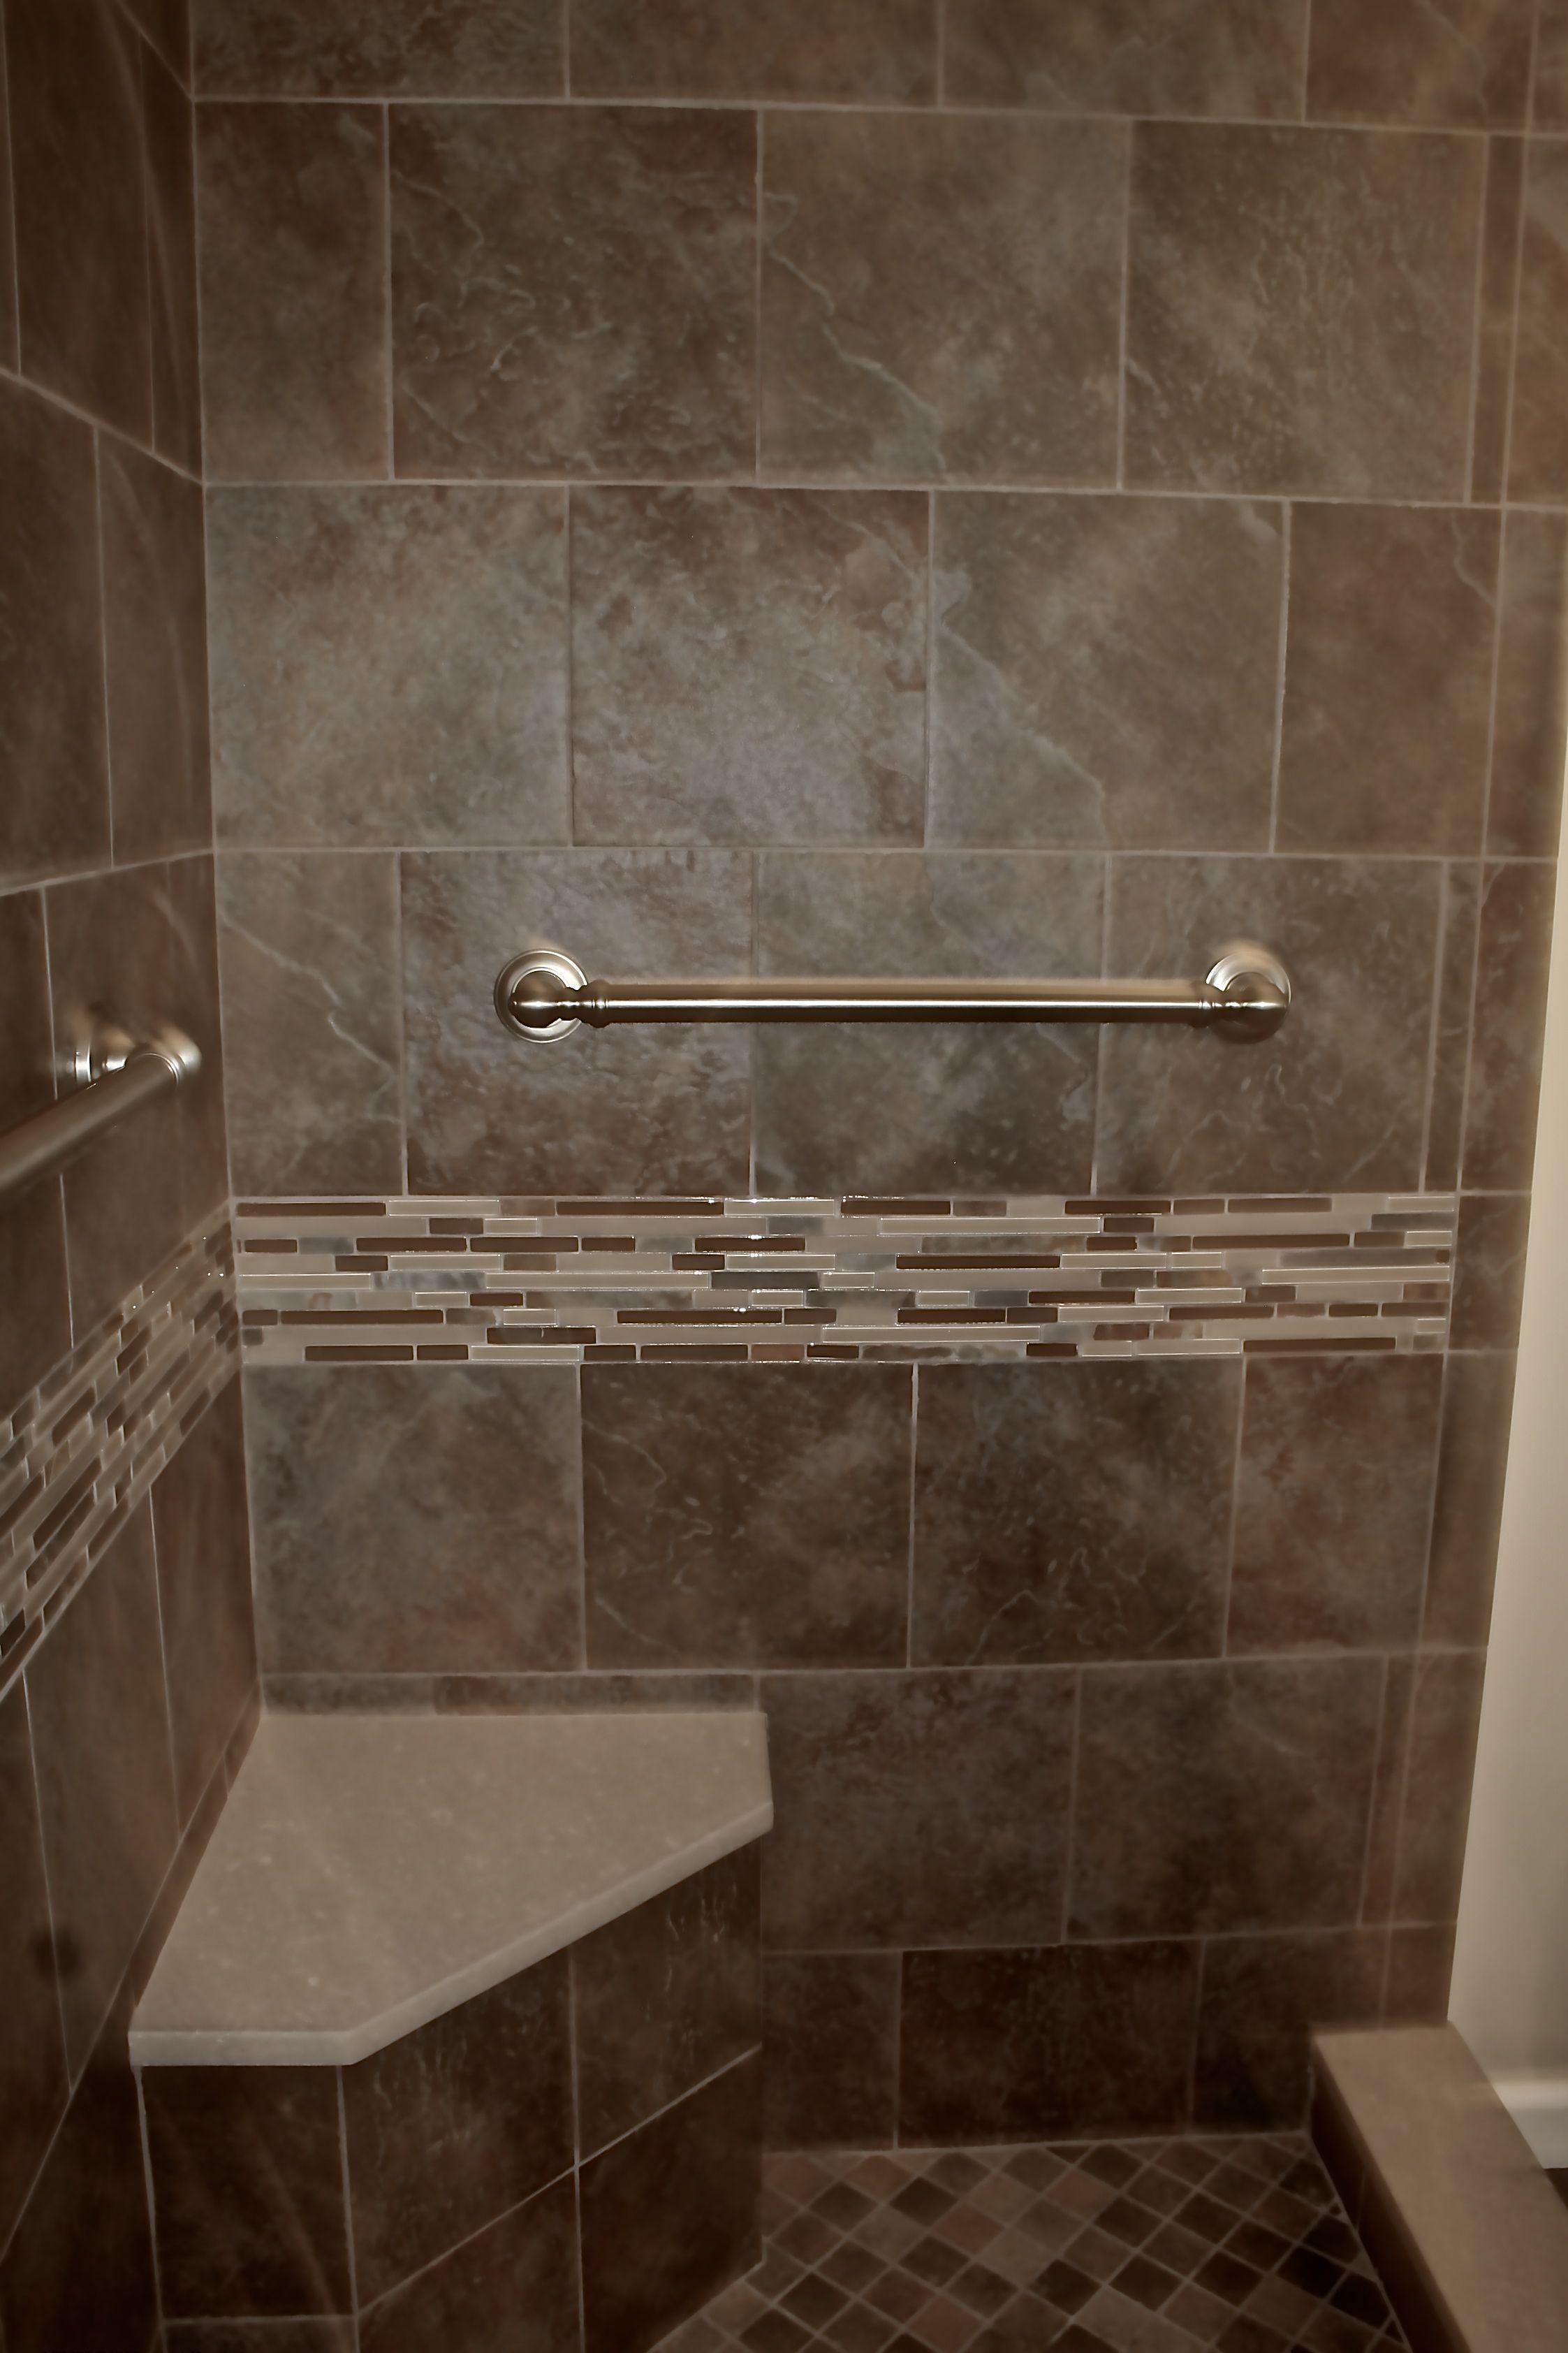 Contemporary Bathroom Remodel Slate Tiled Frameless Glass Shower Mosaic Glass And Slate Contemporary Bathroom Remodel Kitchen And Bath Remodeling Bath Remodel